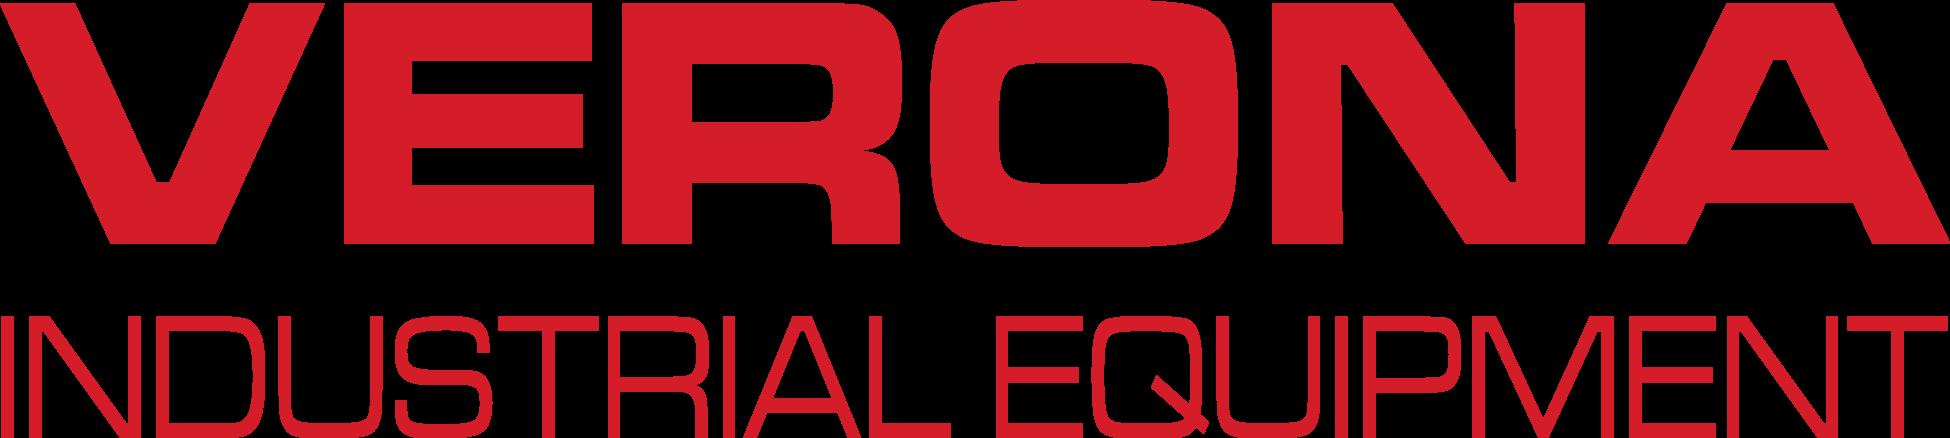 vie verona industrial equipment logo